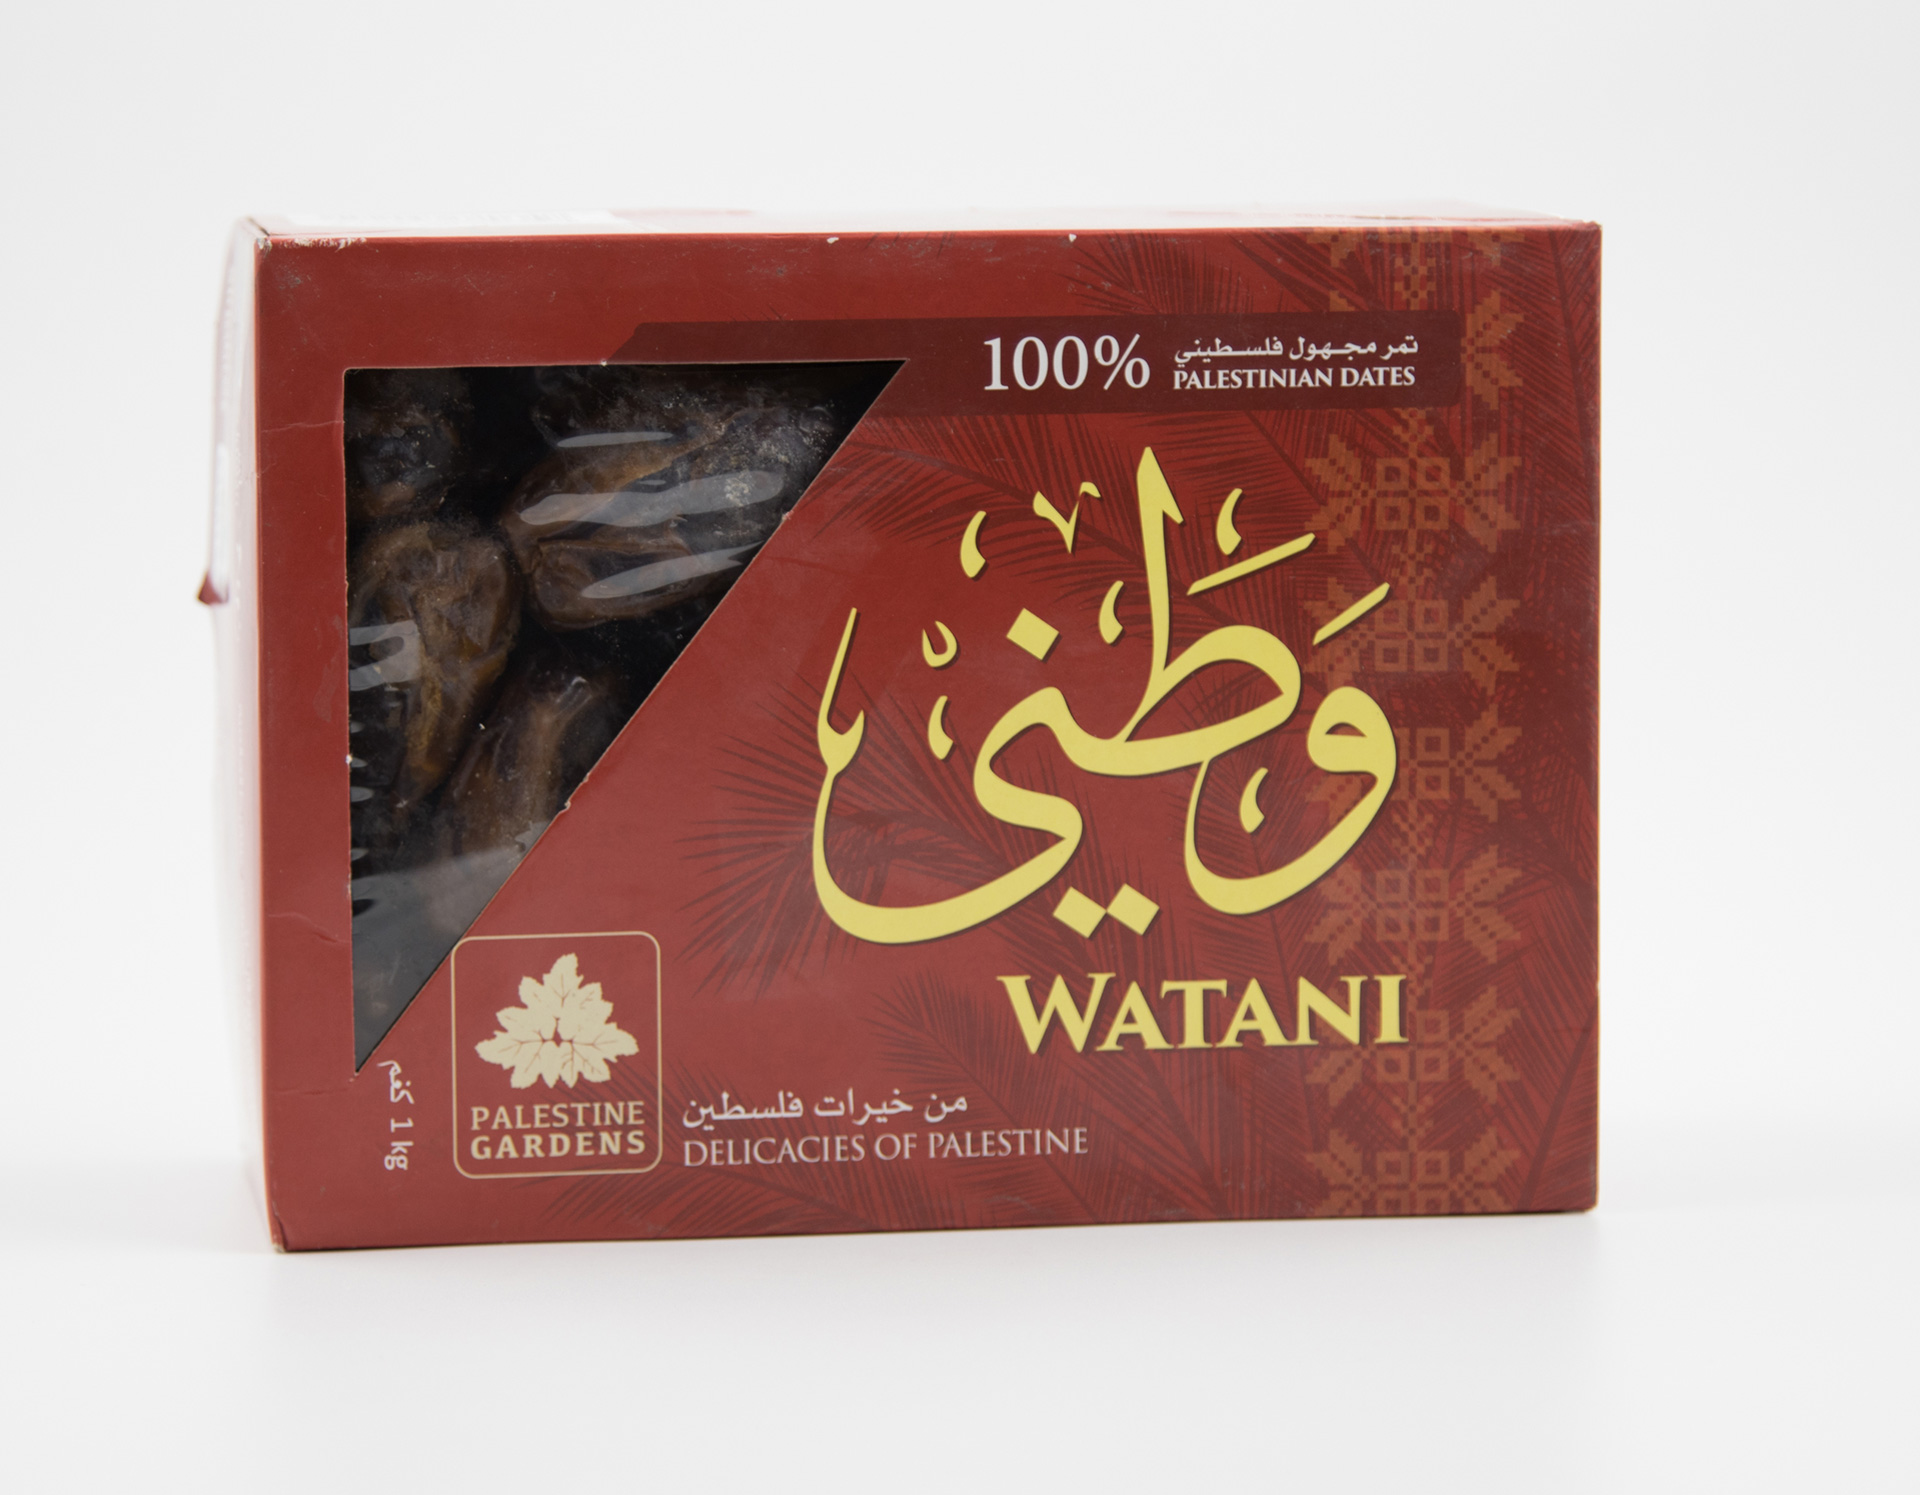 Watani 1Kg